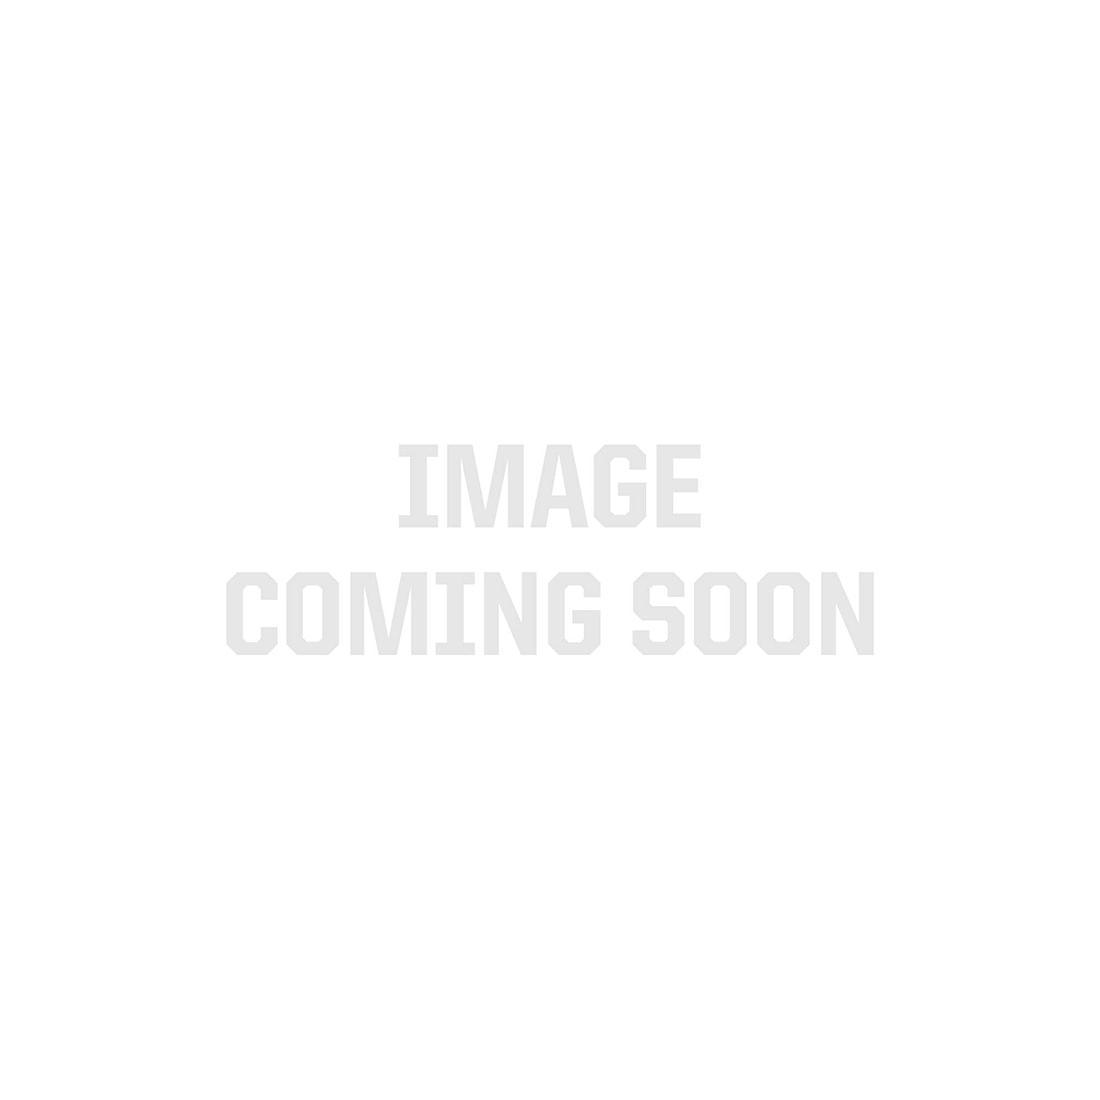 Neutral White 5630 Single Row CurrentControl LED Strip Light, 126/m, 12mm wide, Sample Kit